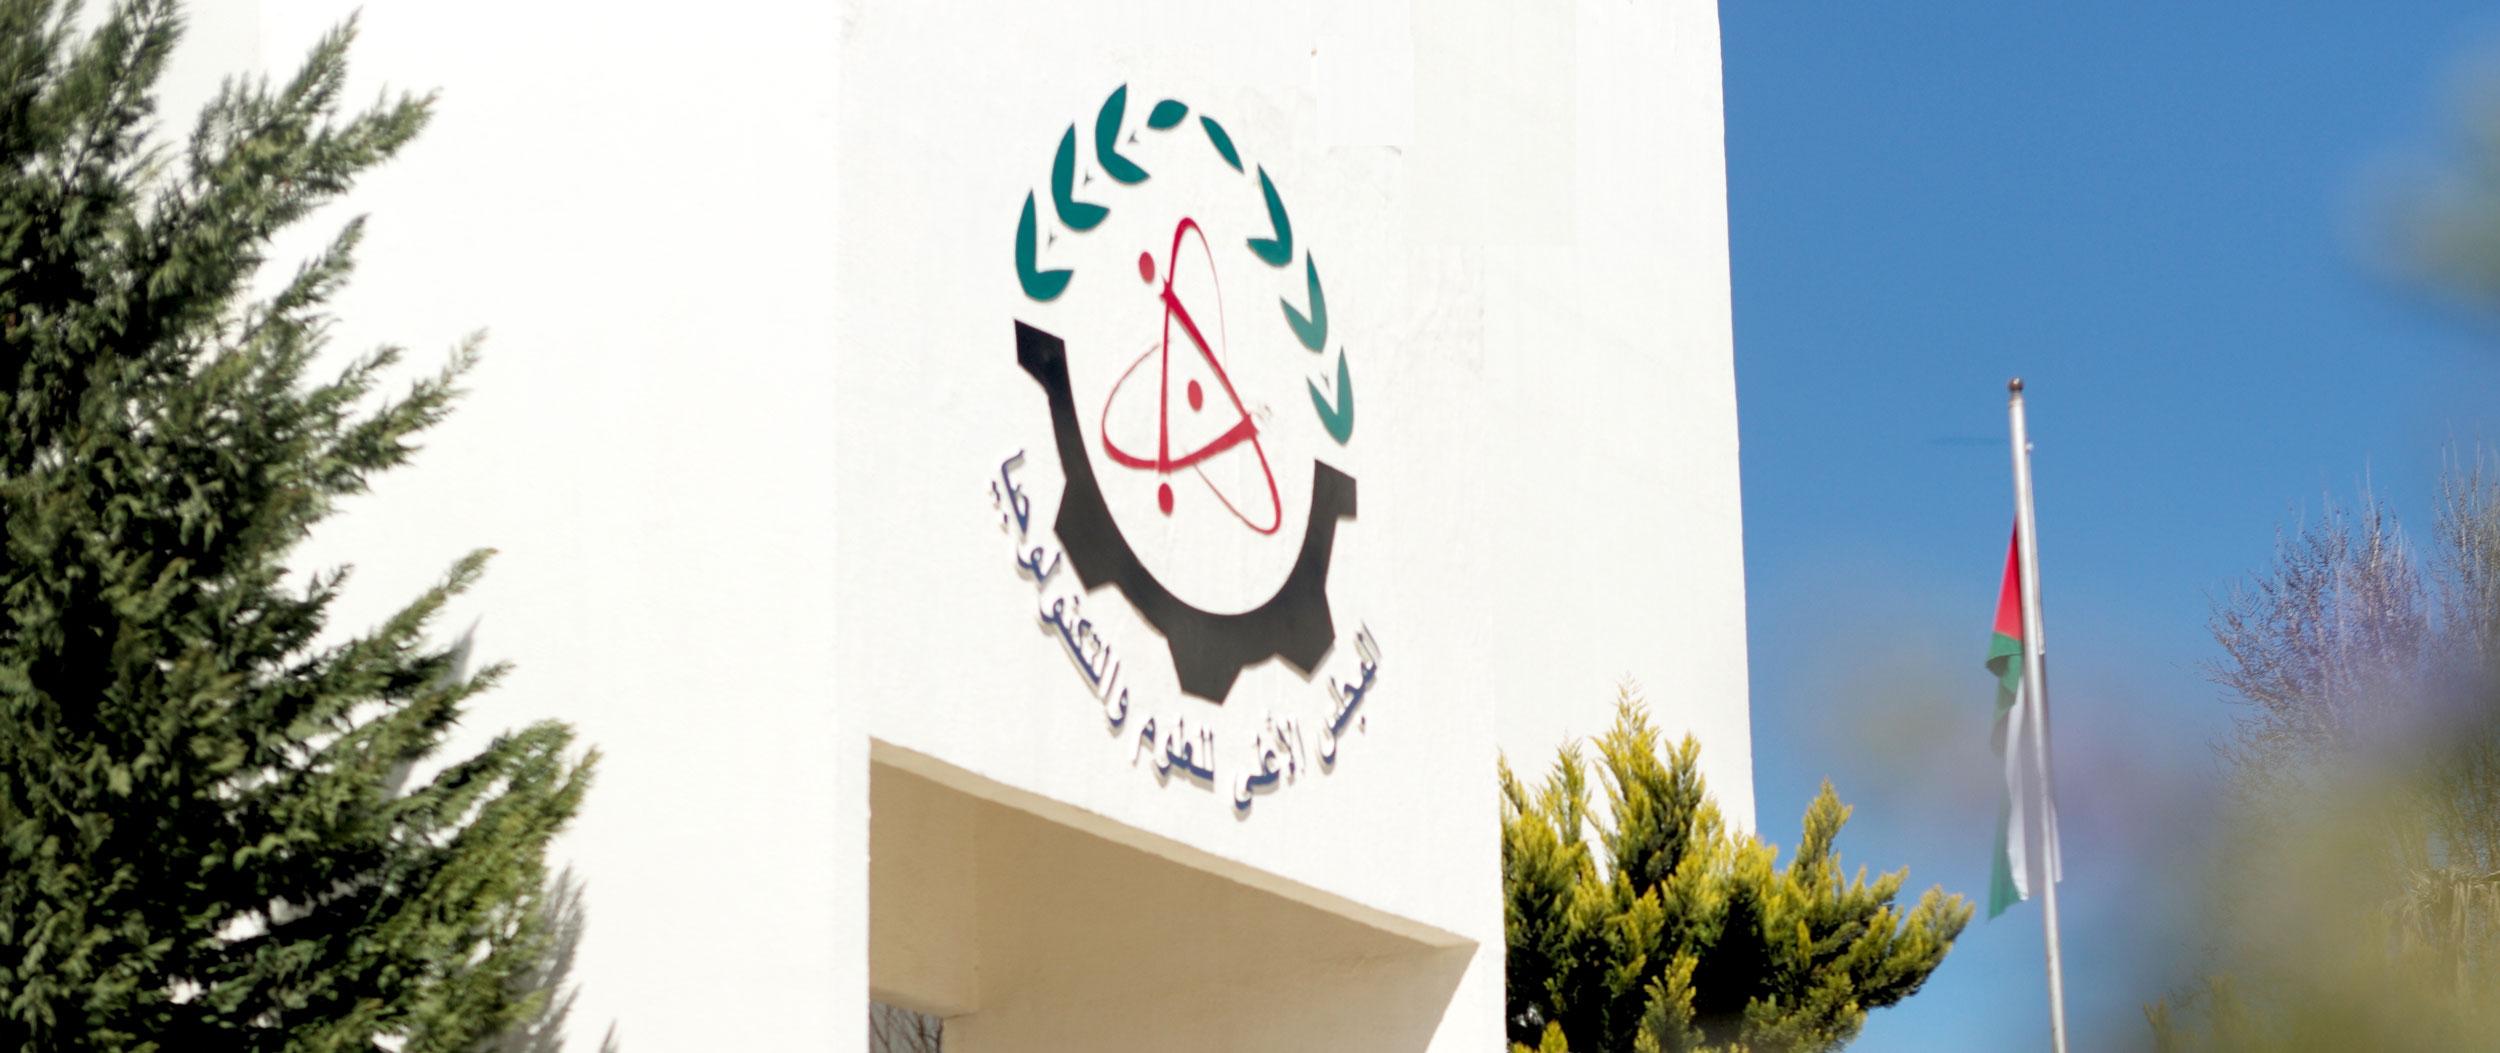 The Jordanian Higher Council for Science and Technology, Amman, Jordan